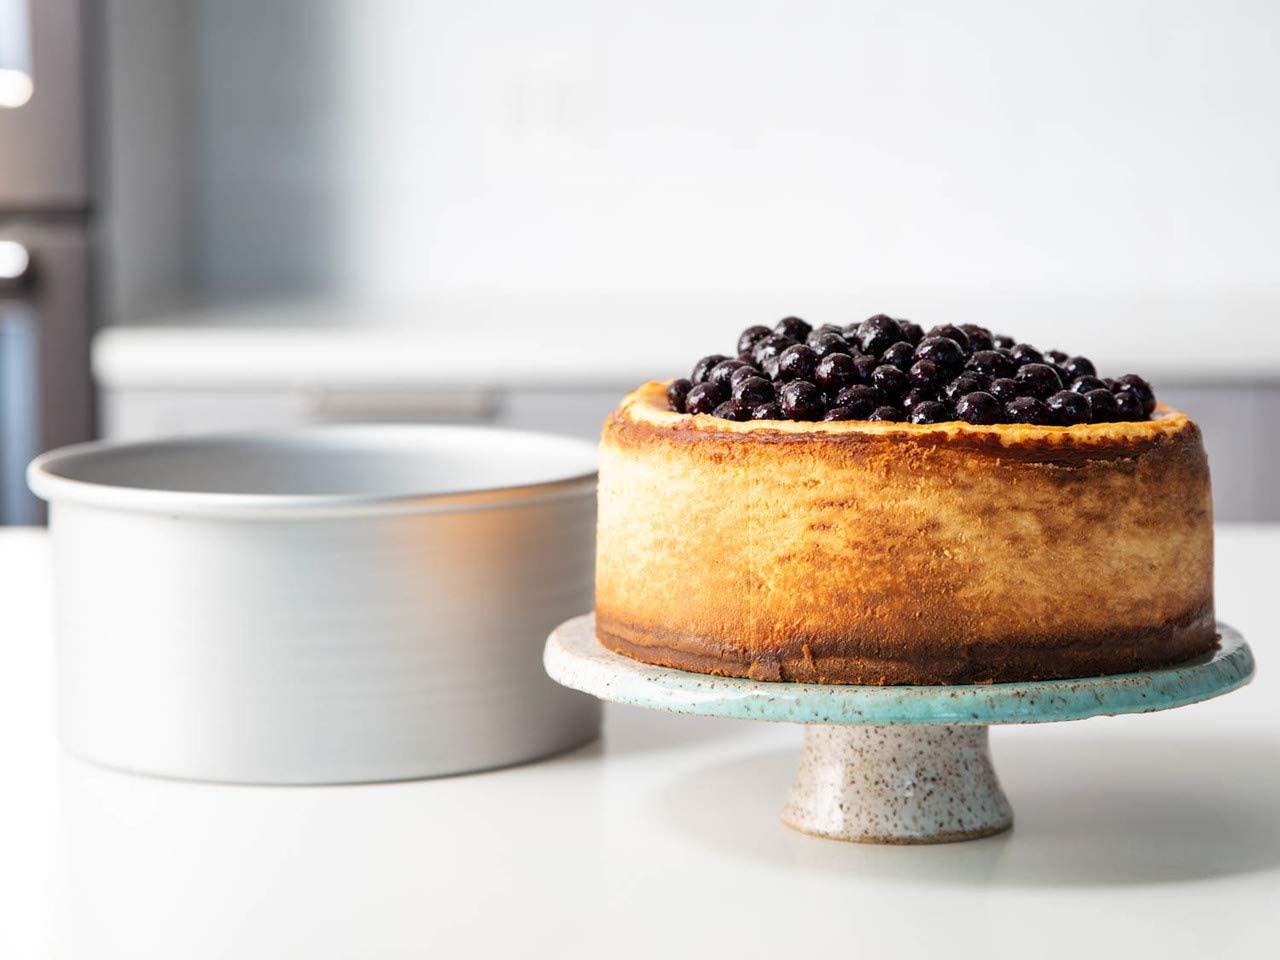 Lloyd Pans Kitchenware Cheesecake Pan 8